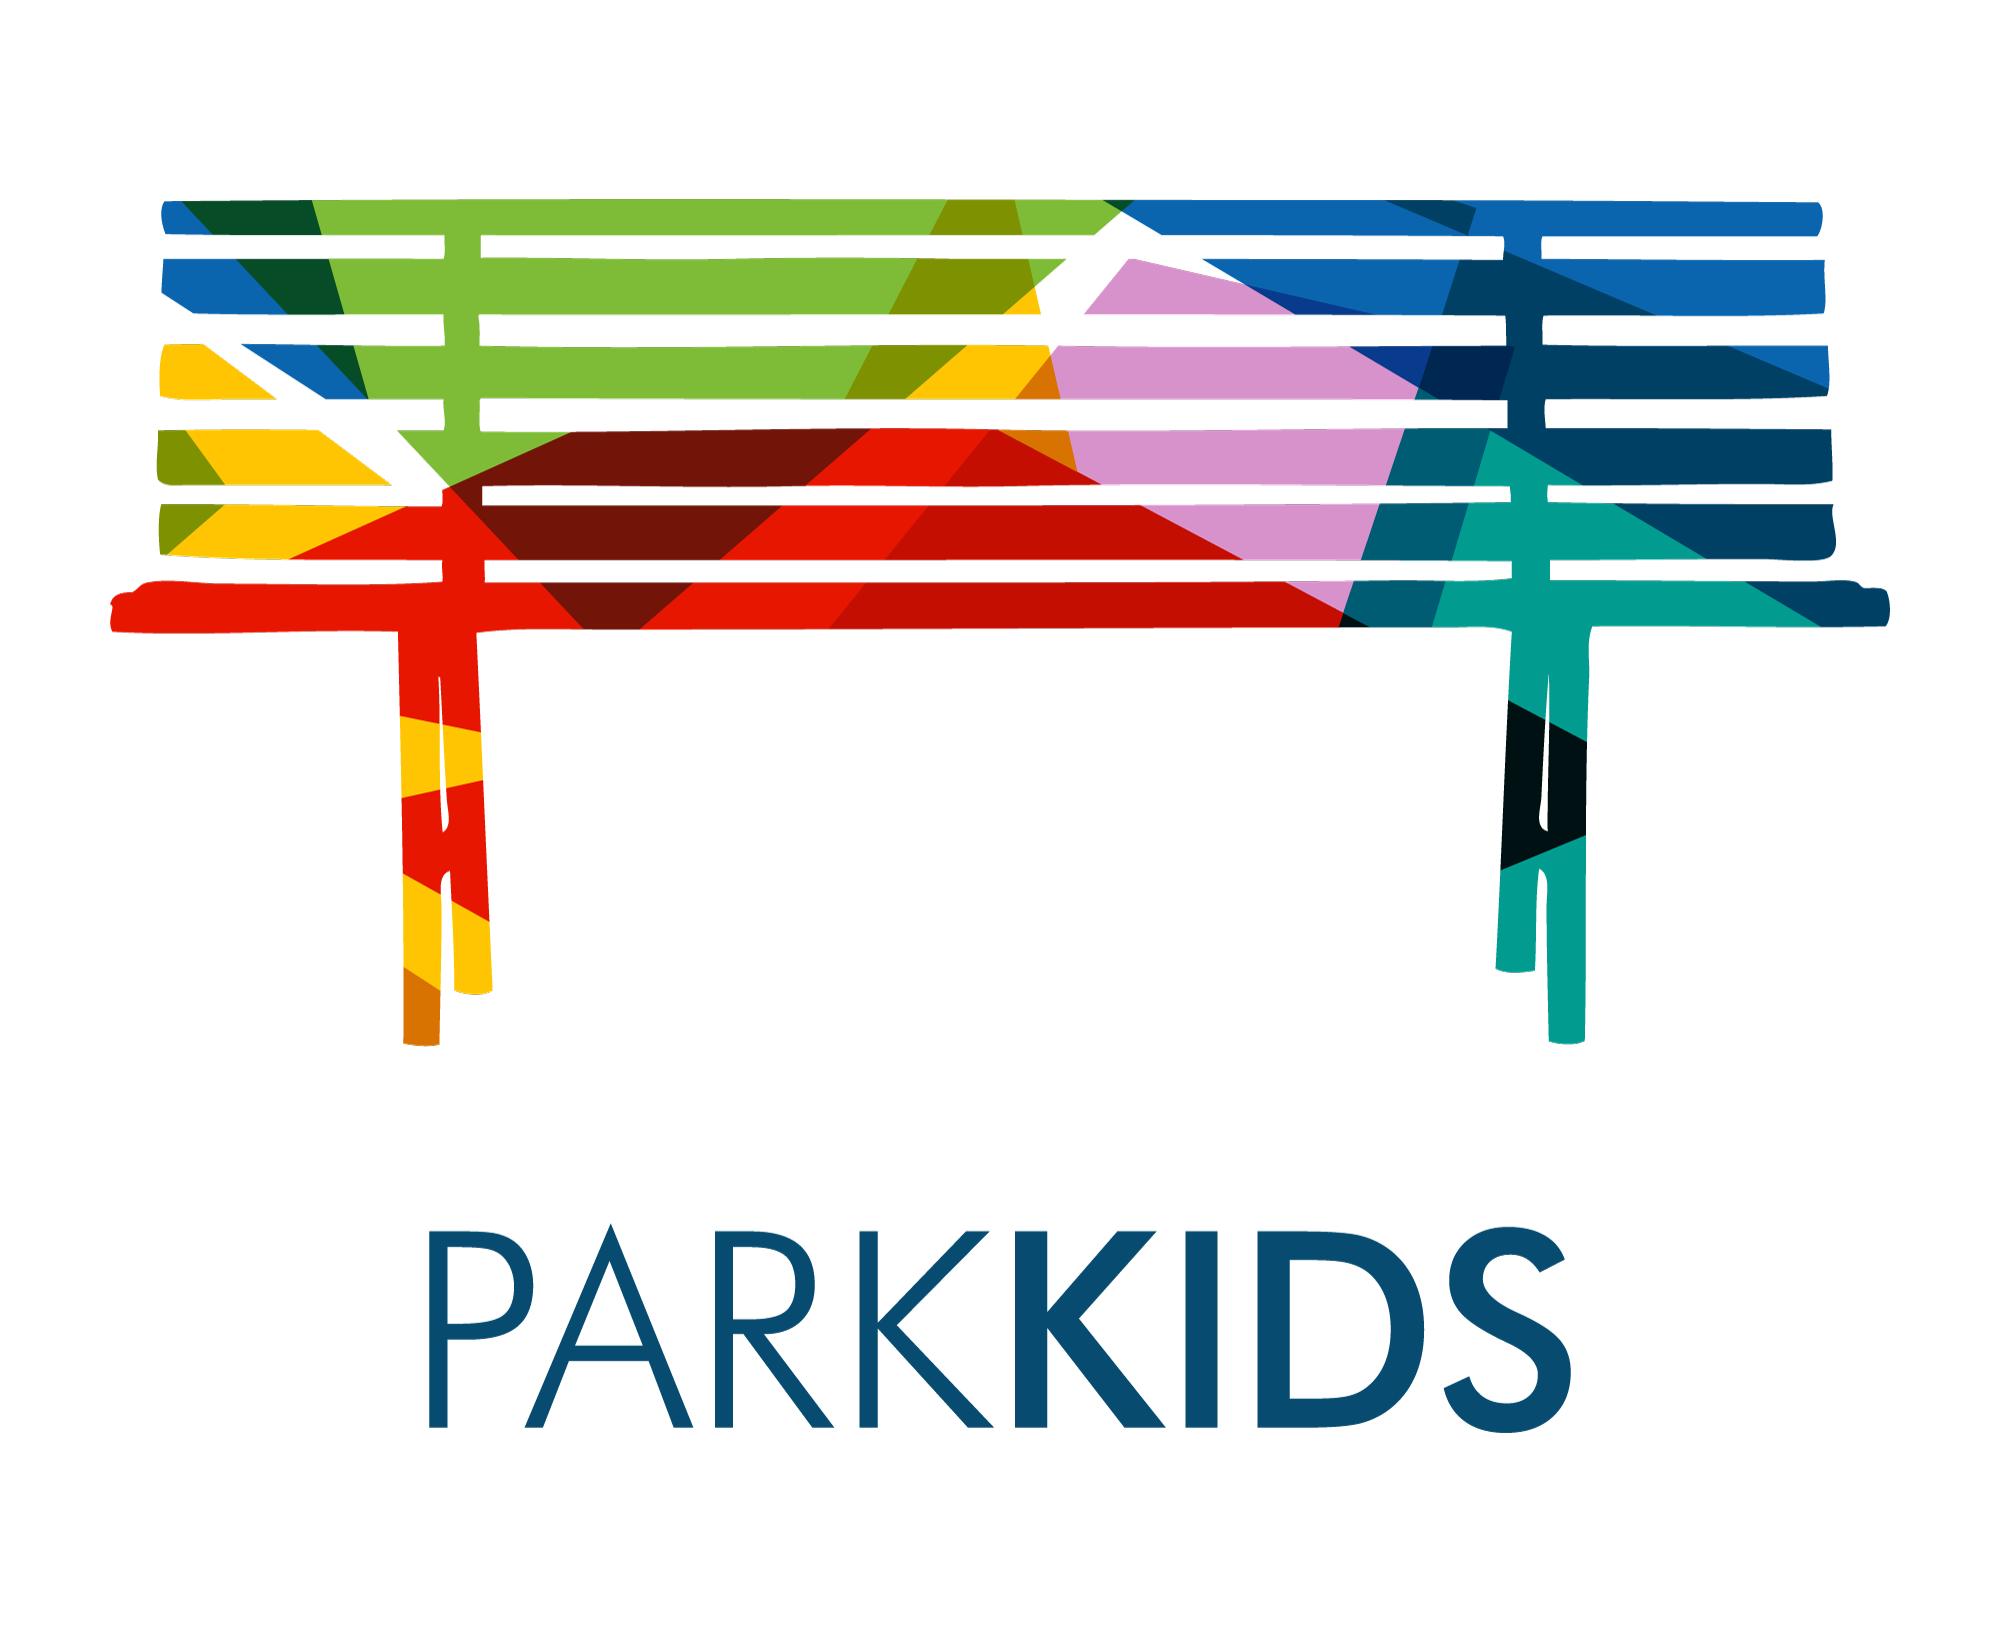 Park Kids Brand